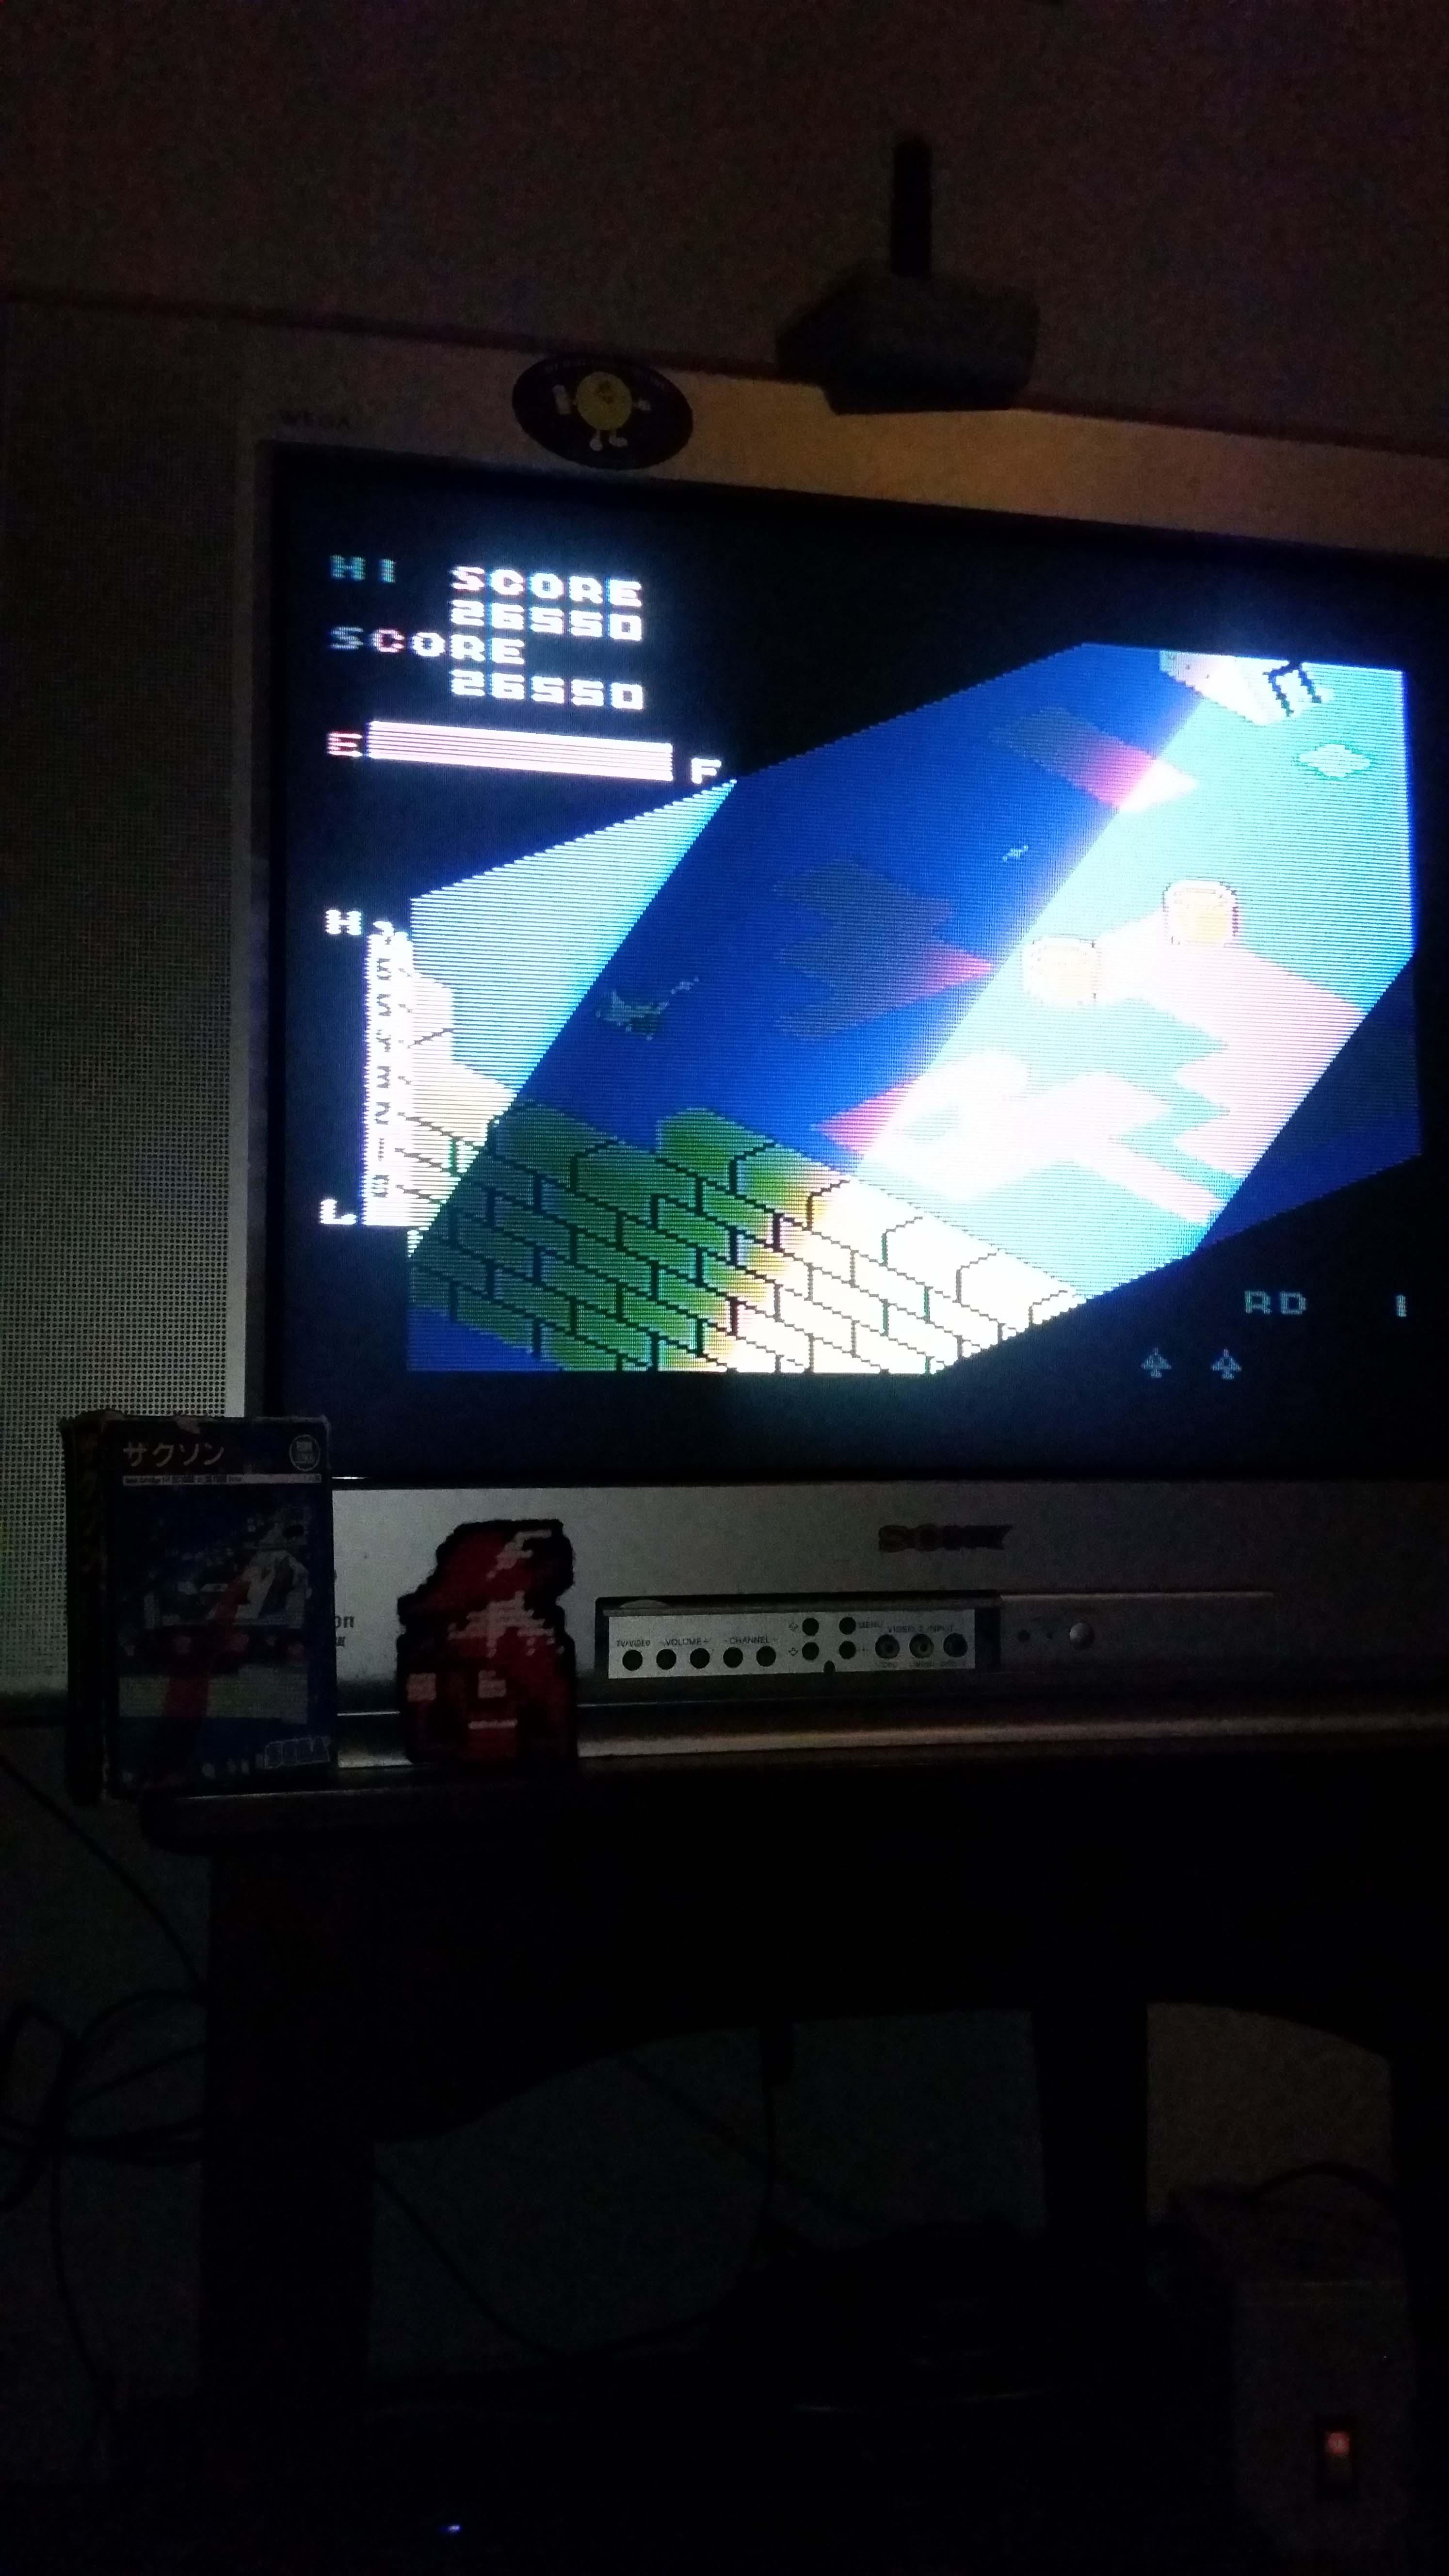 RedMage: Zaxxon (Sega SG-1000) 26,550 points on 2018-04-18 10:39:01